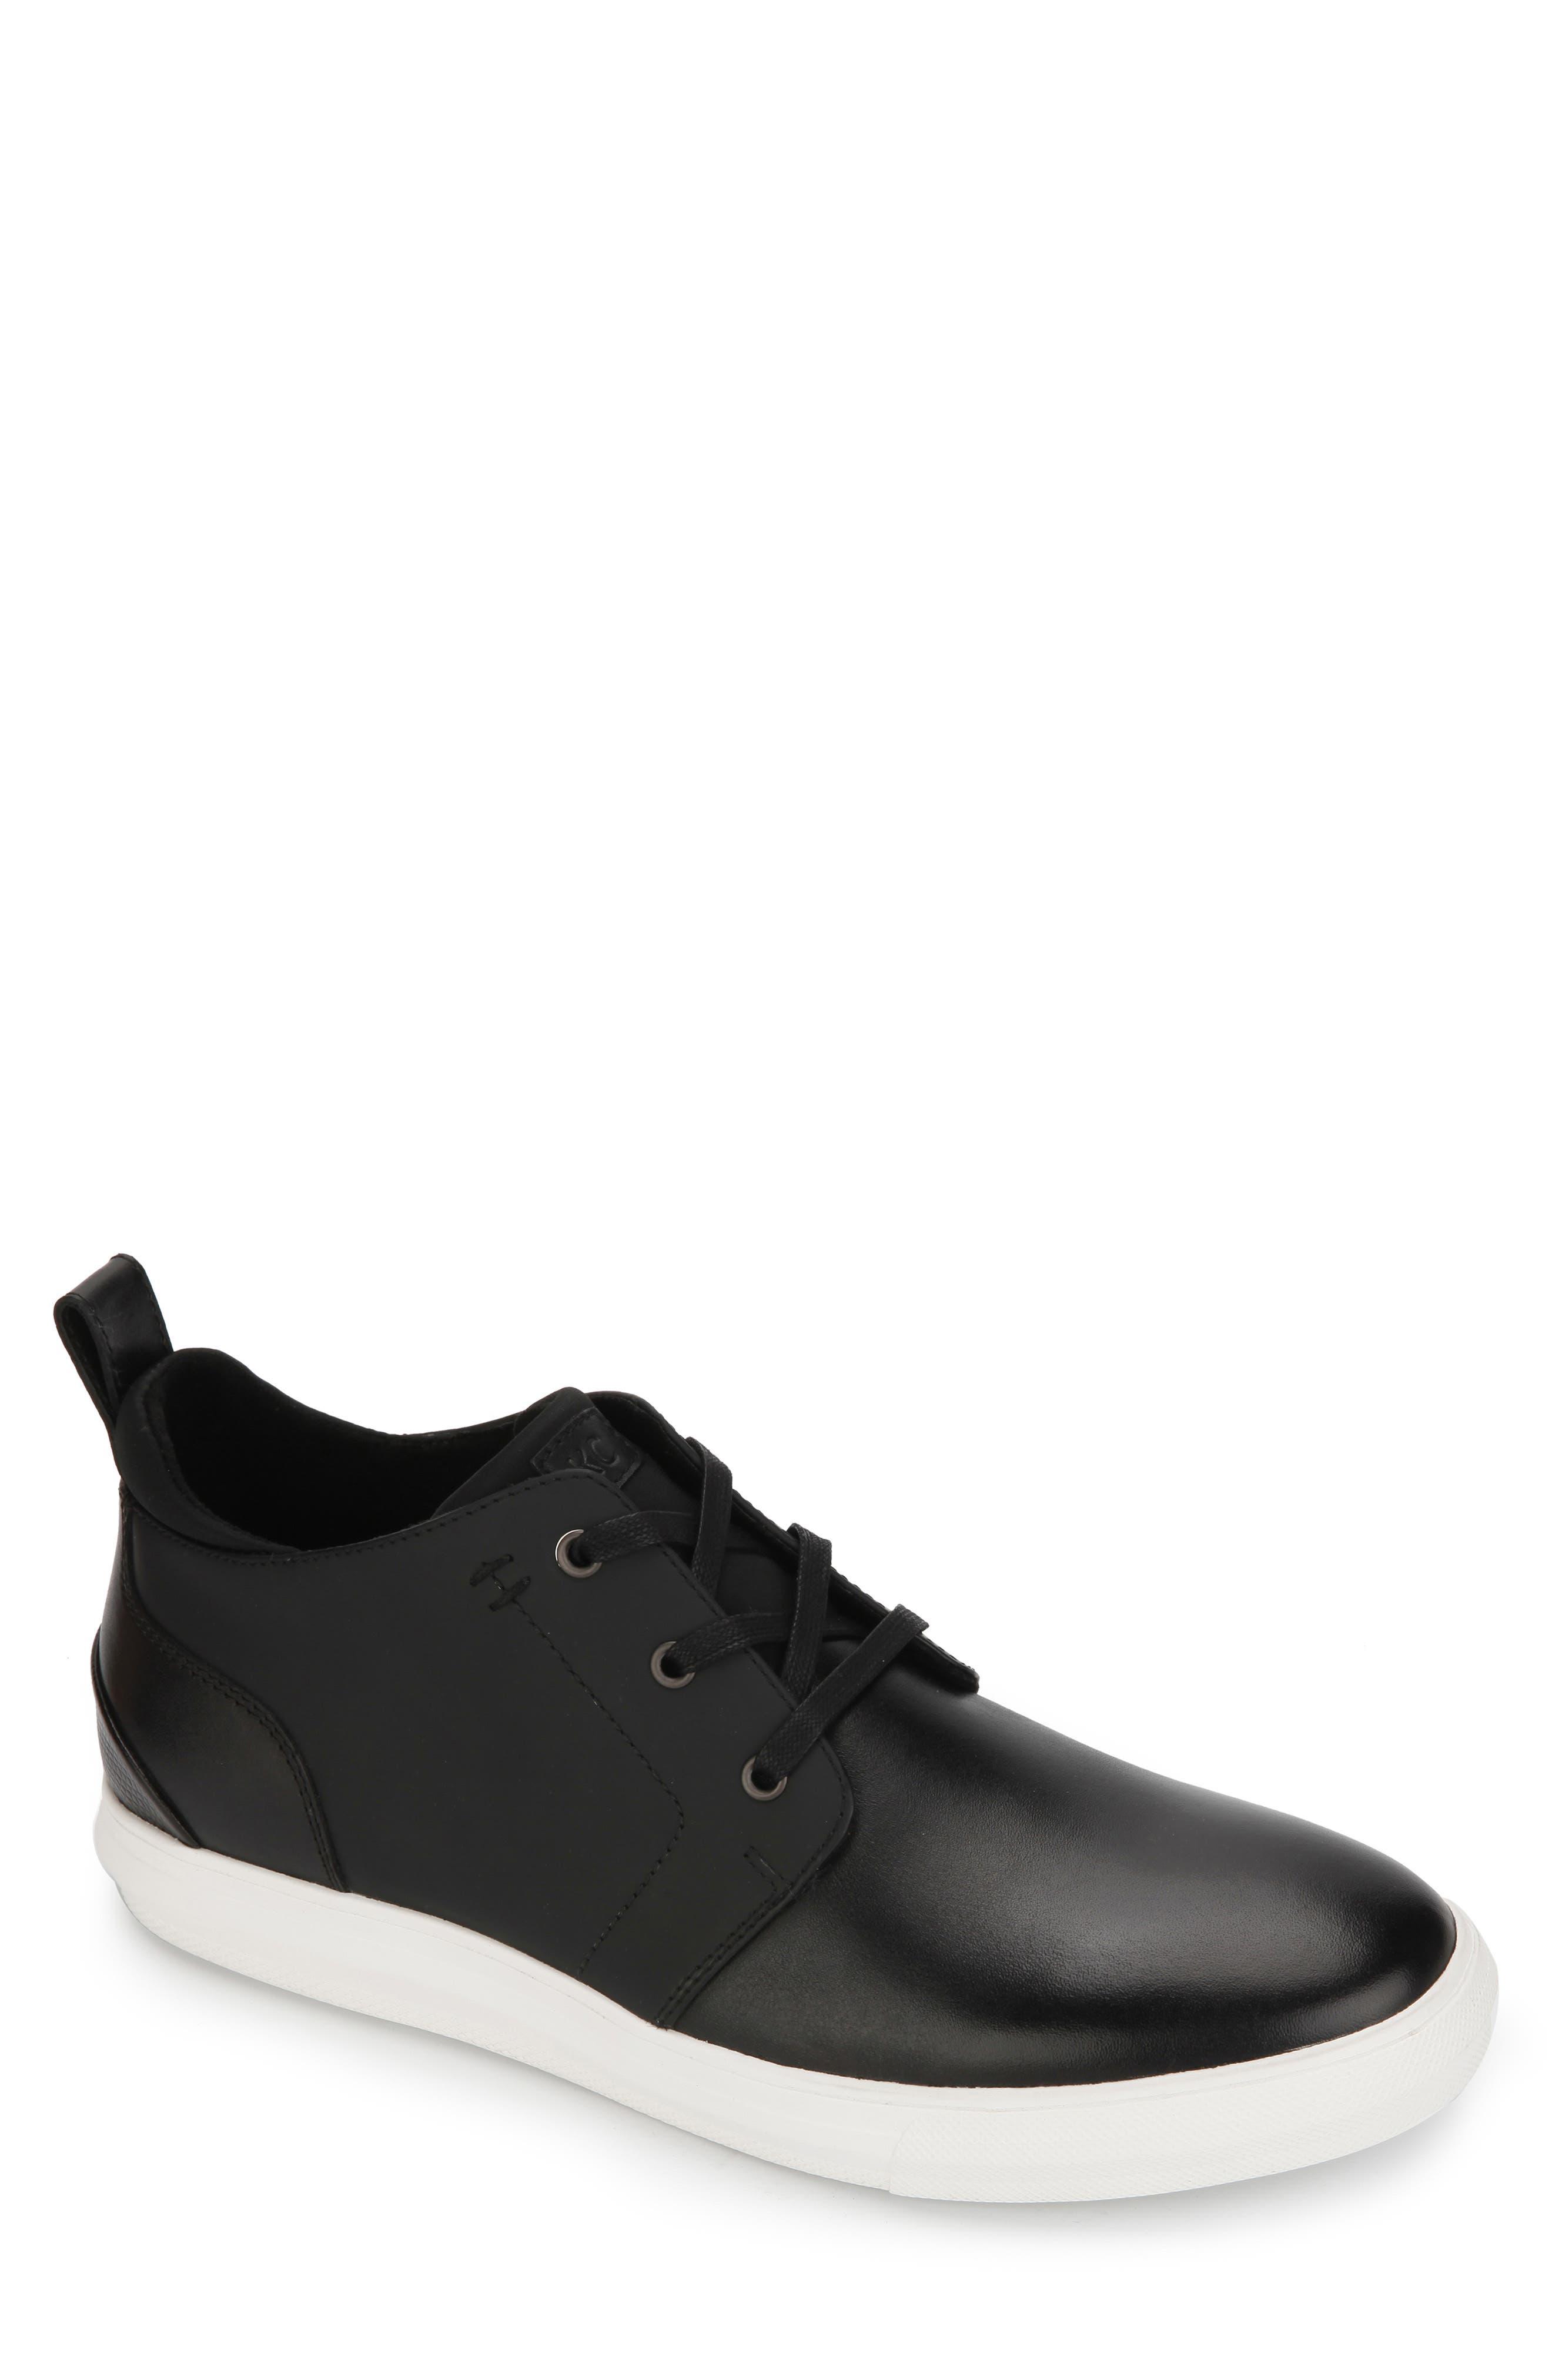 REACTION KENNETH COLE Reemer Chukka Sneaker, Main, color, BLACK